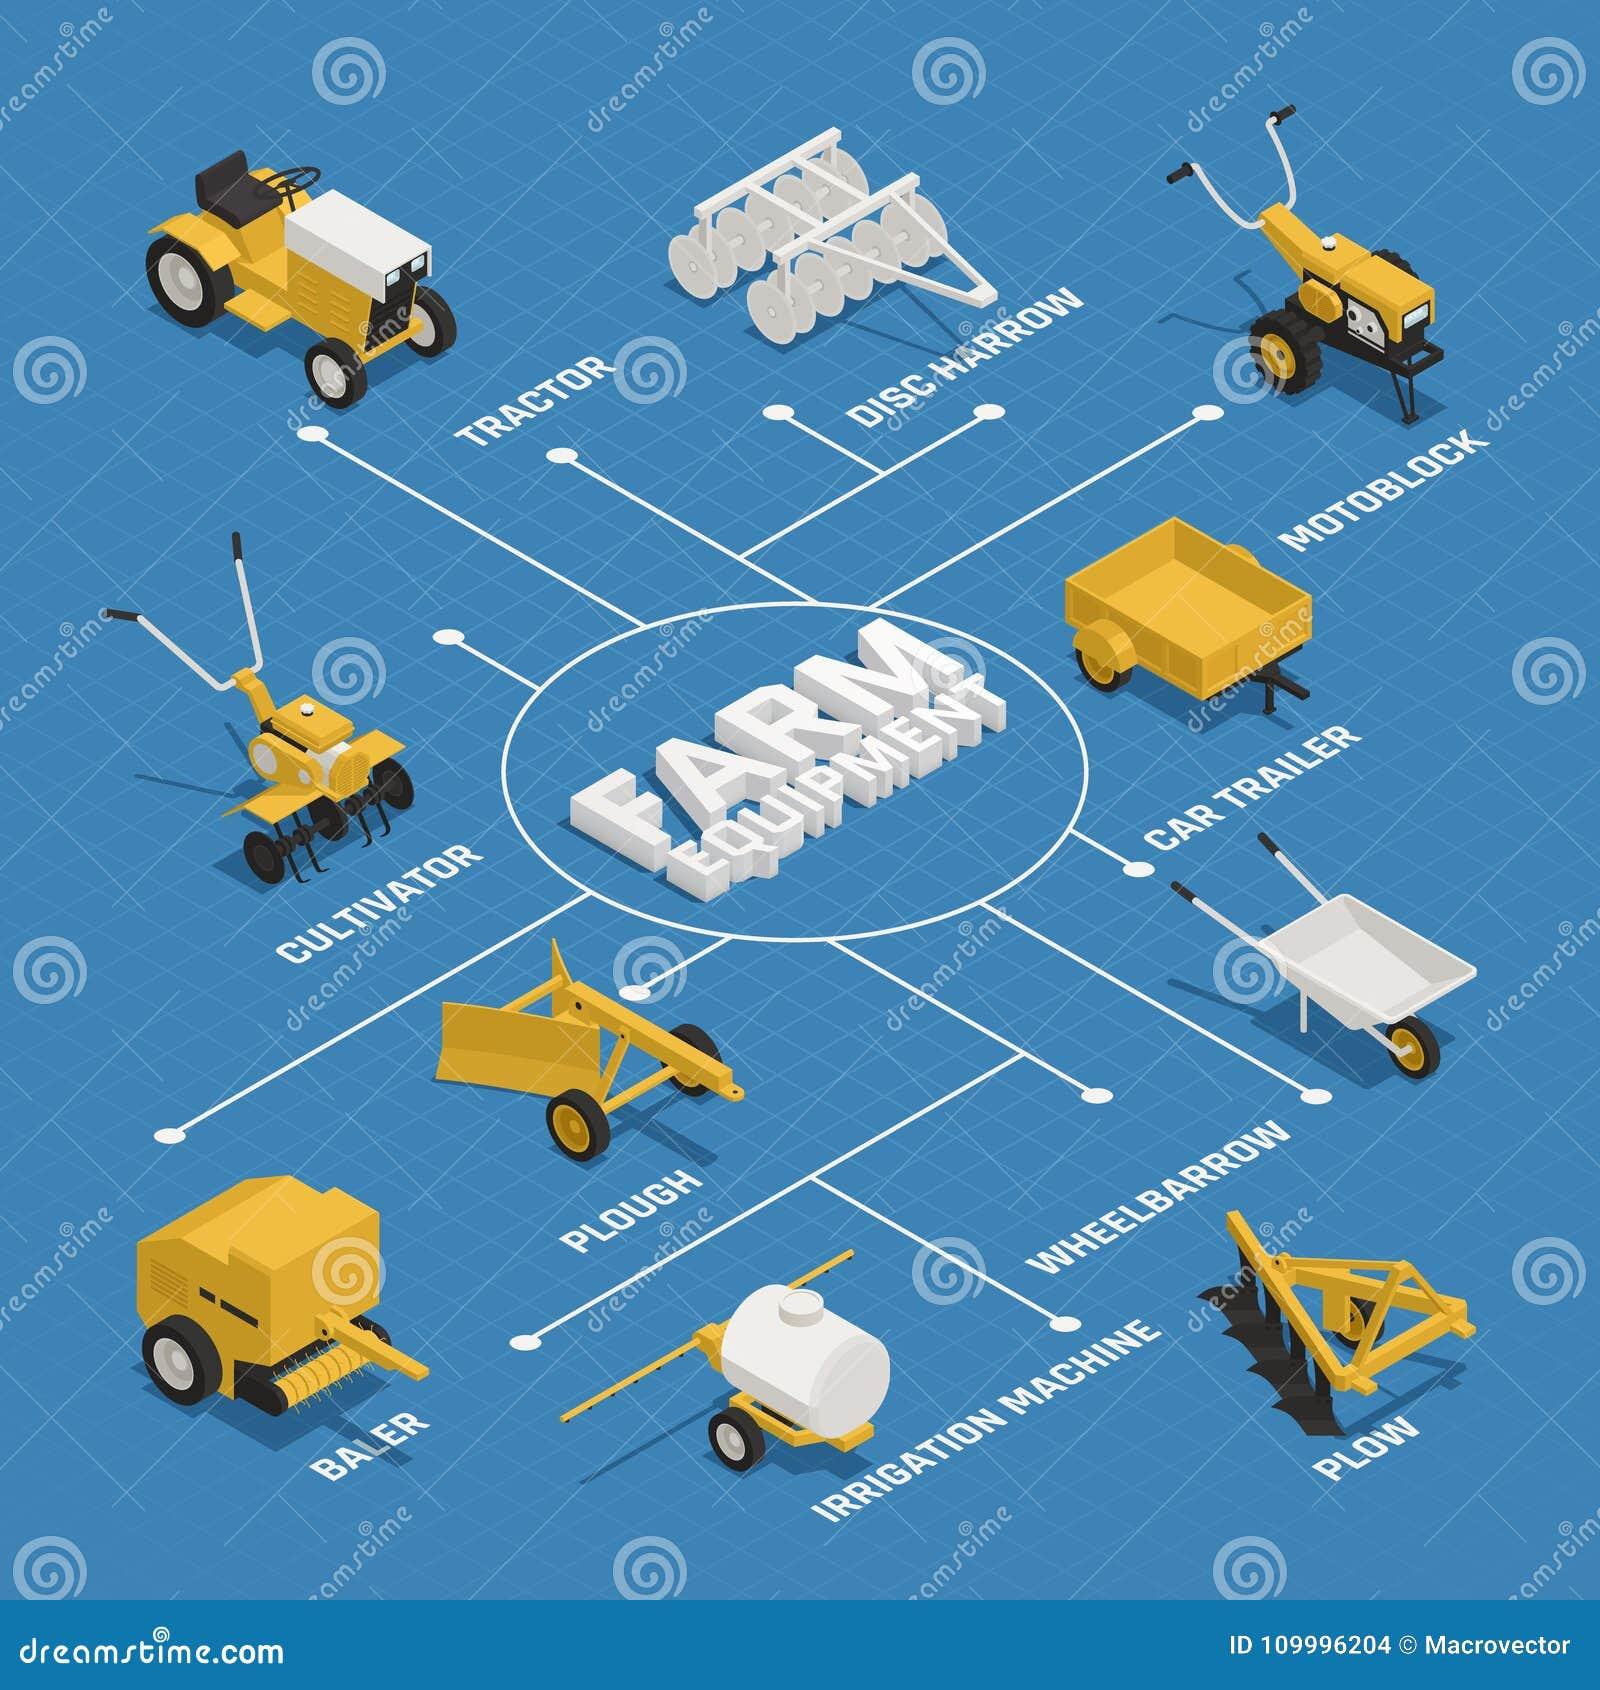 Farming Gardening Machinery Isometric Flowchart